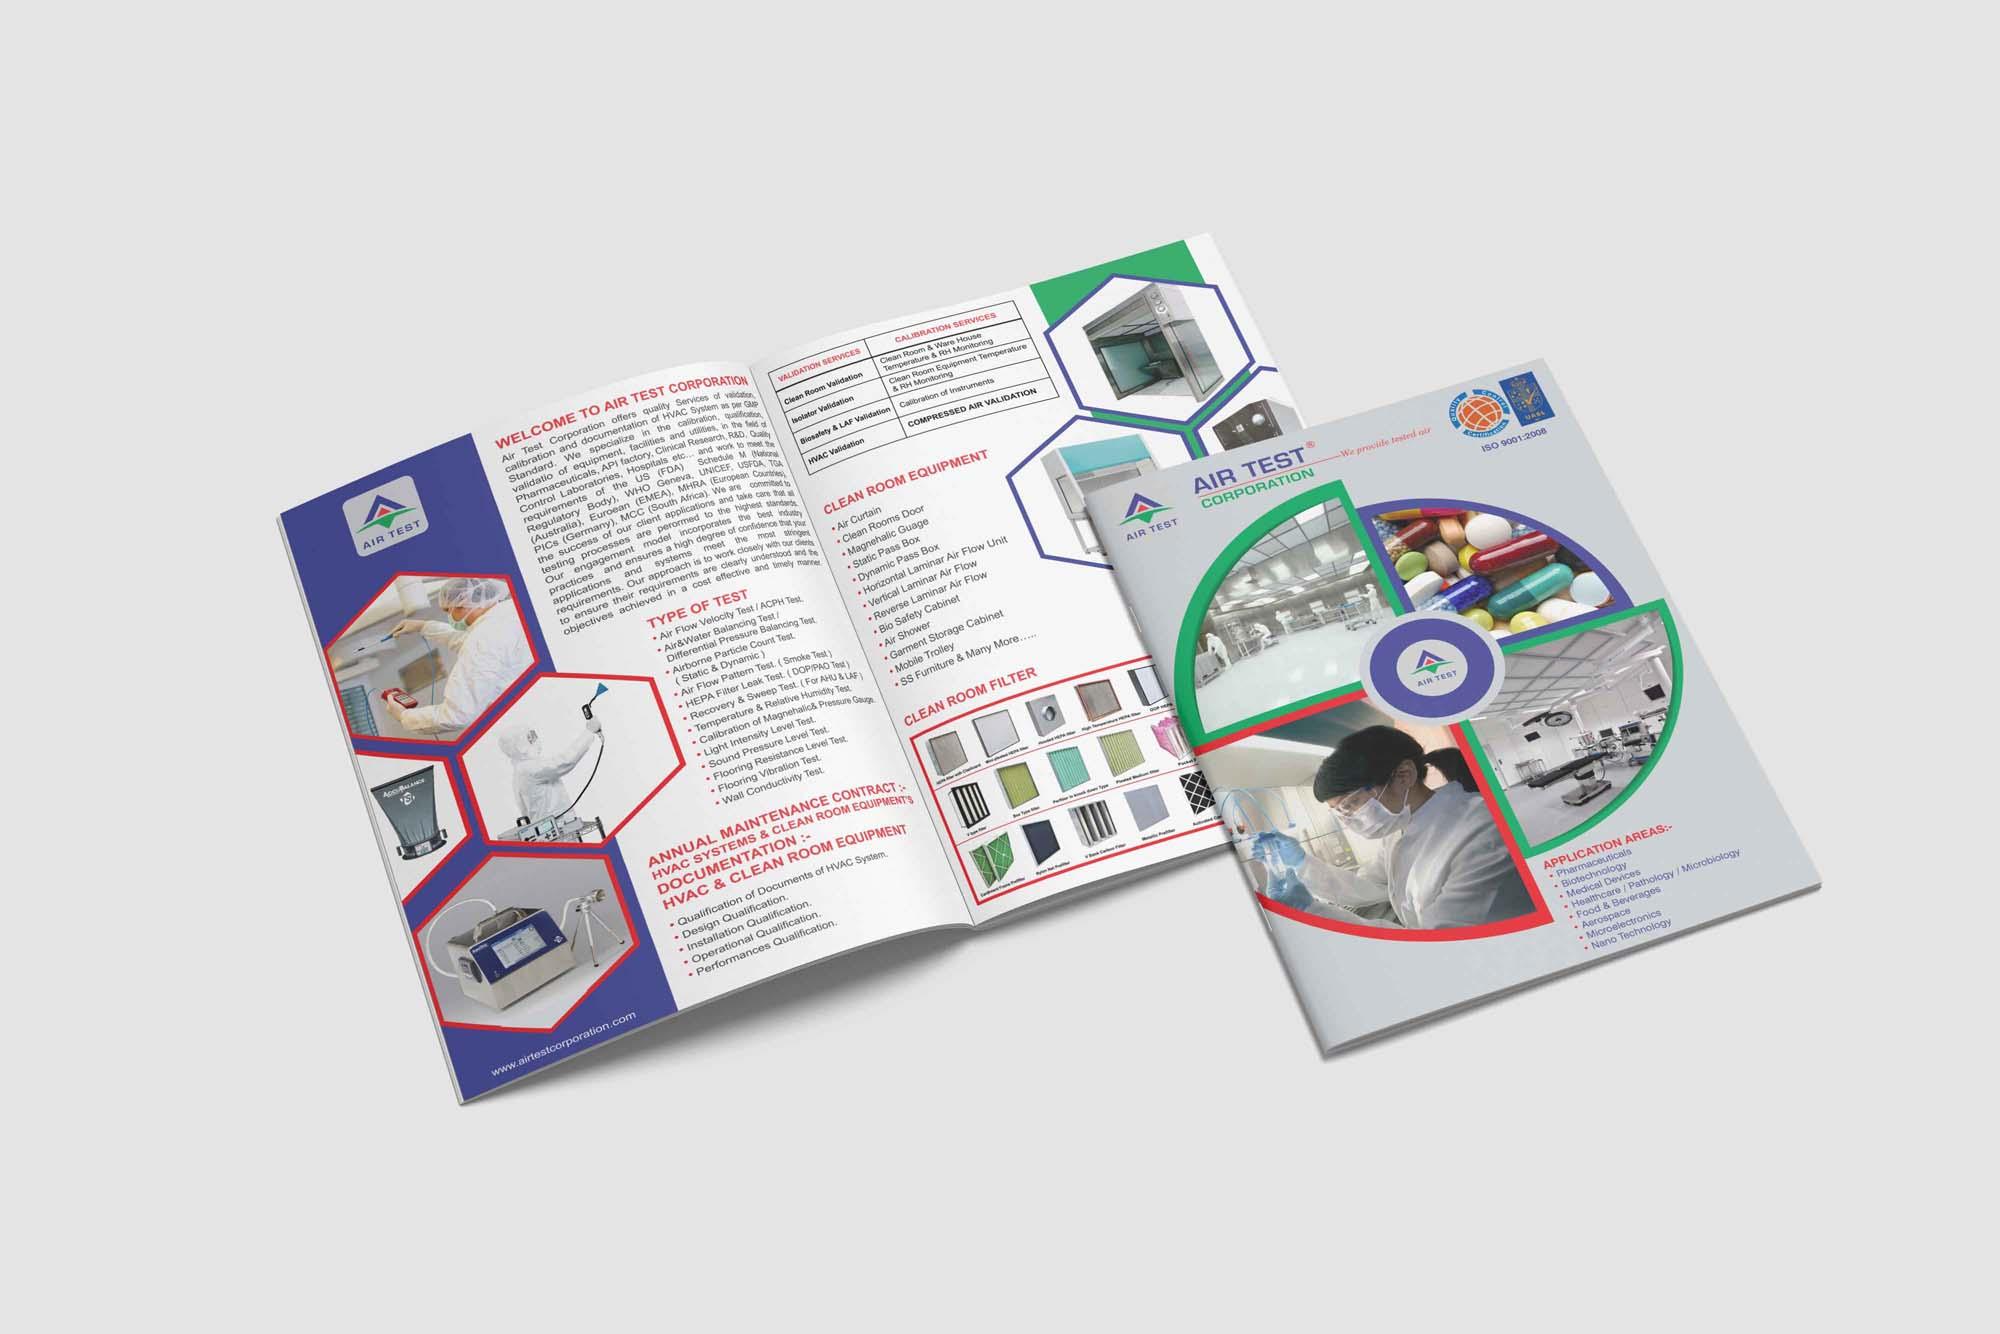 AirTest Corporation Brochure